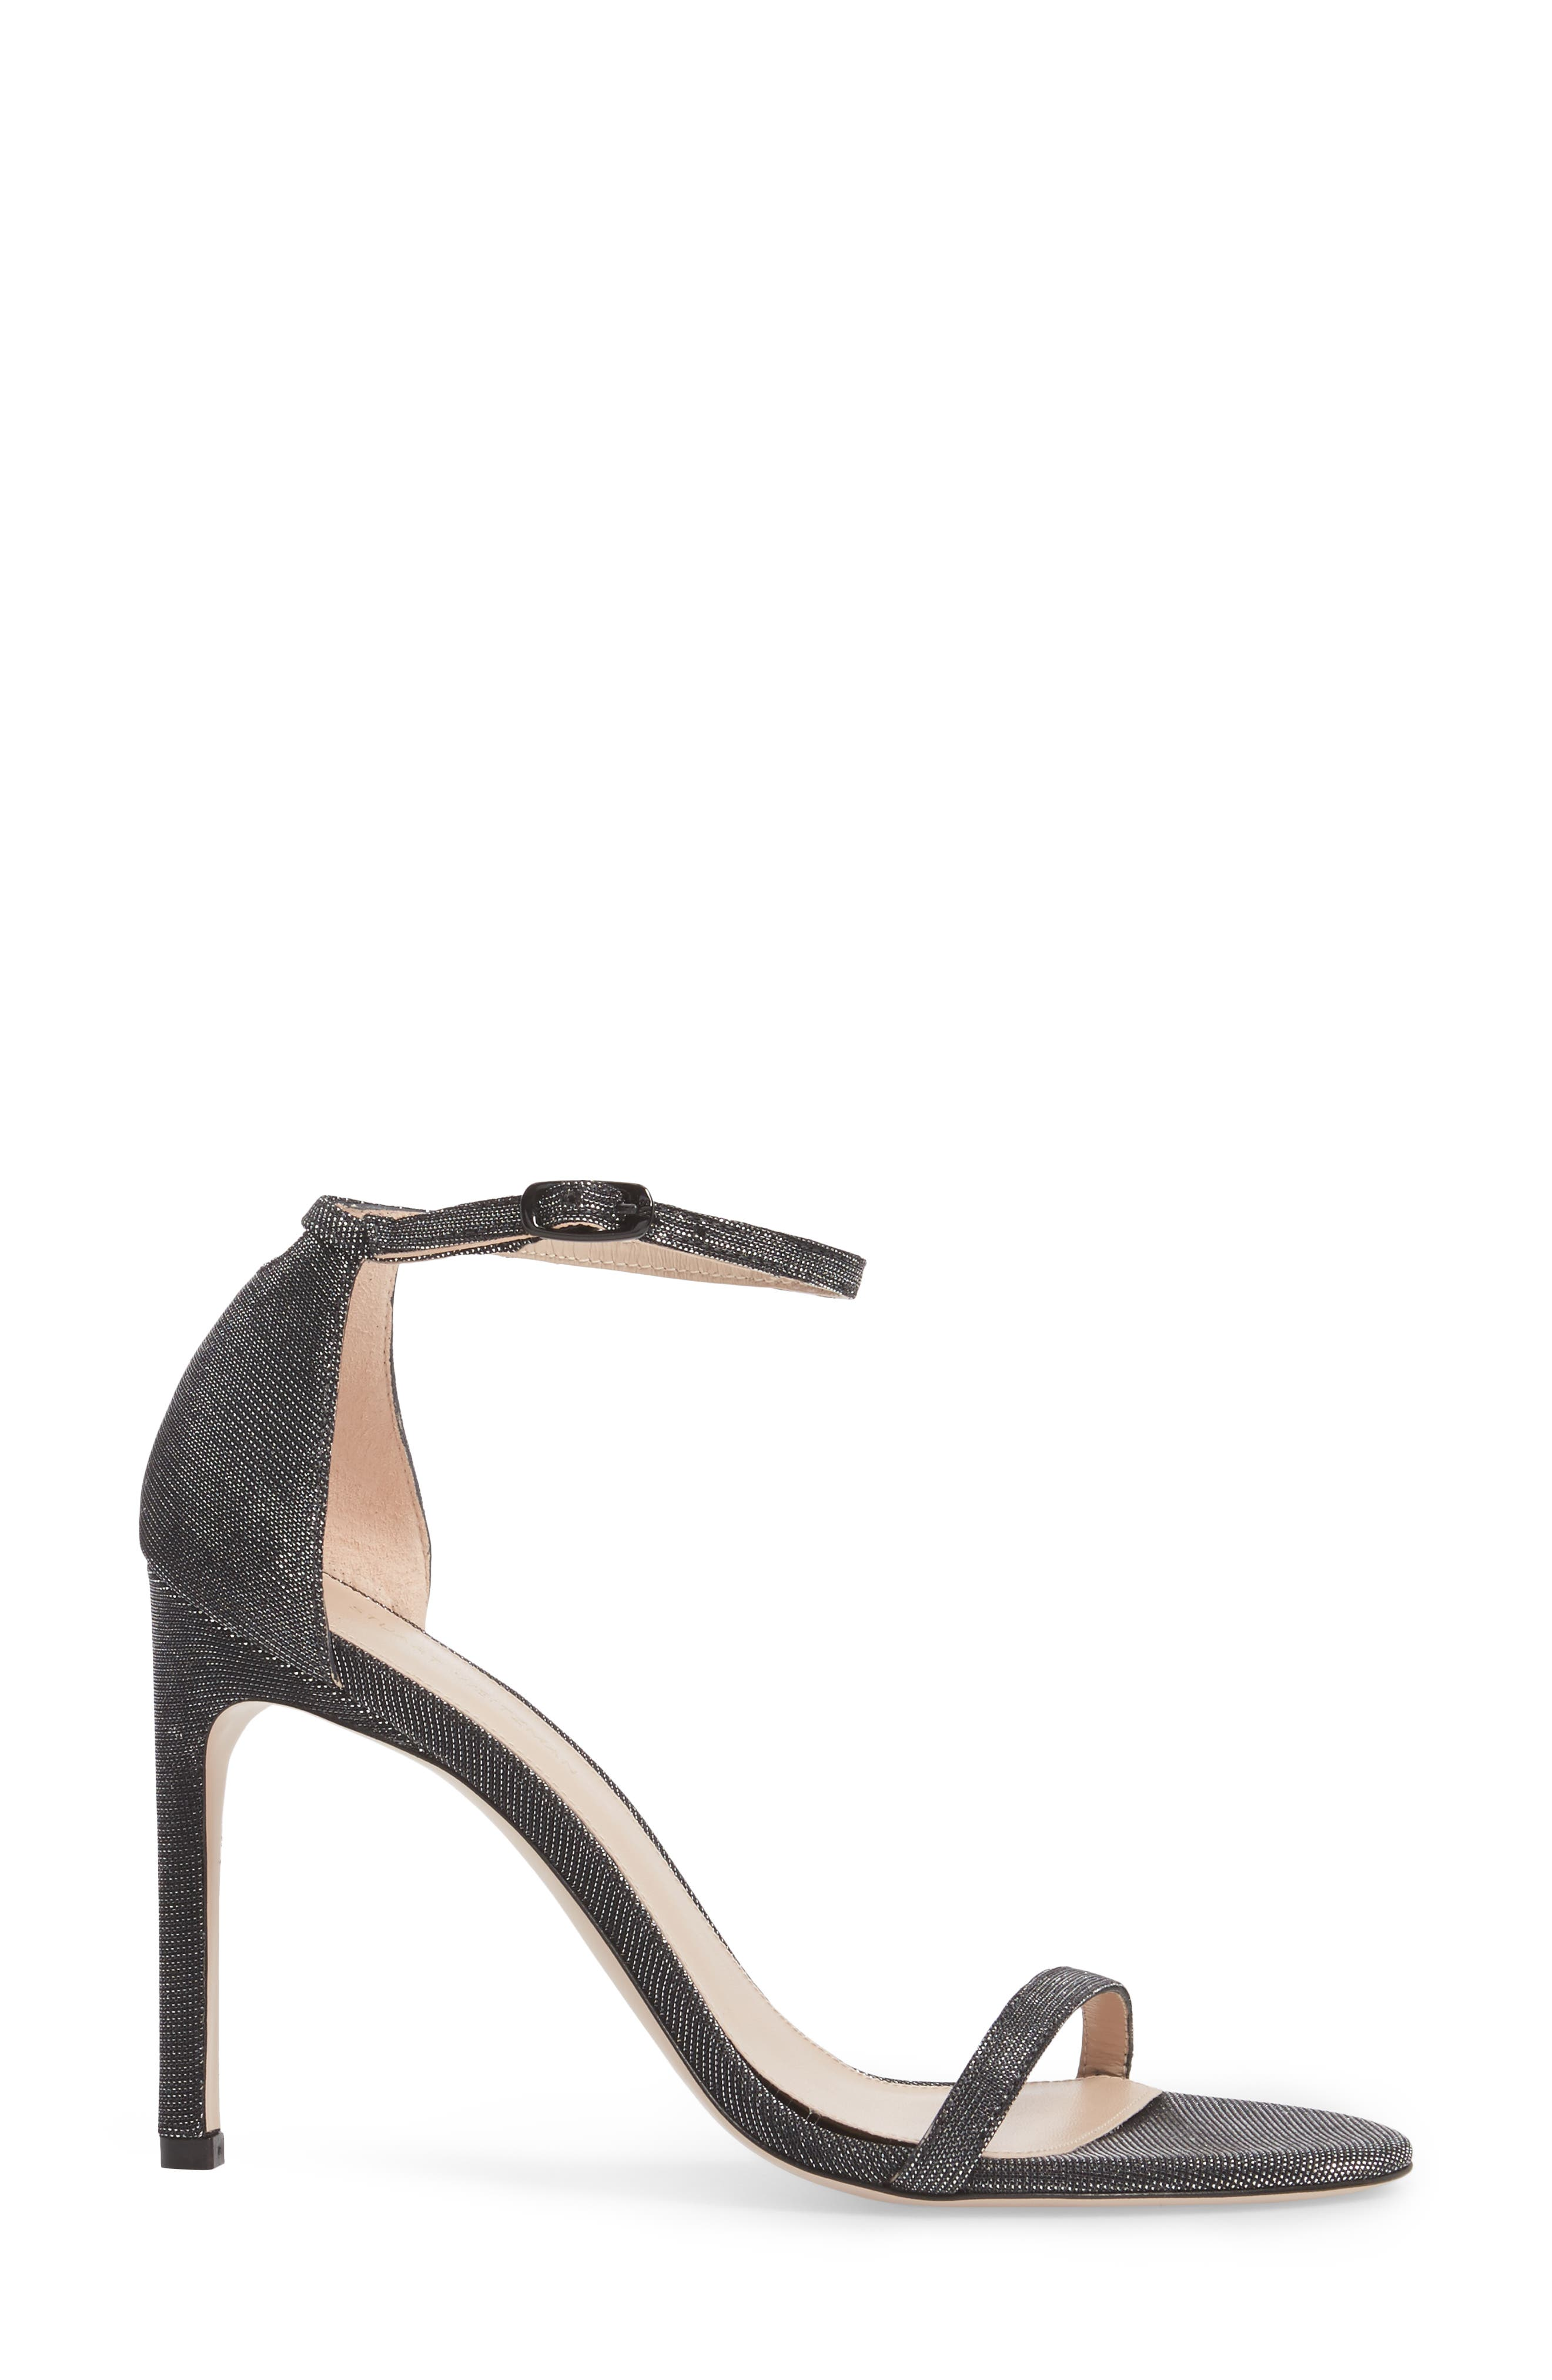 Nudistsong Ankle Strap Sandal,                             Alternate thumbnail 89, color,